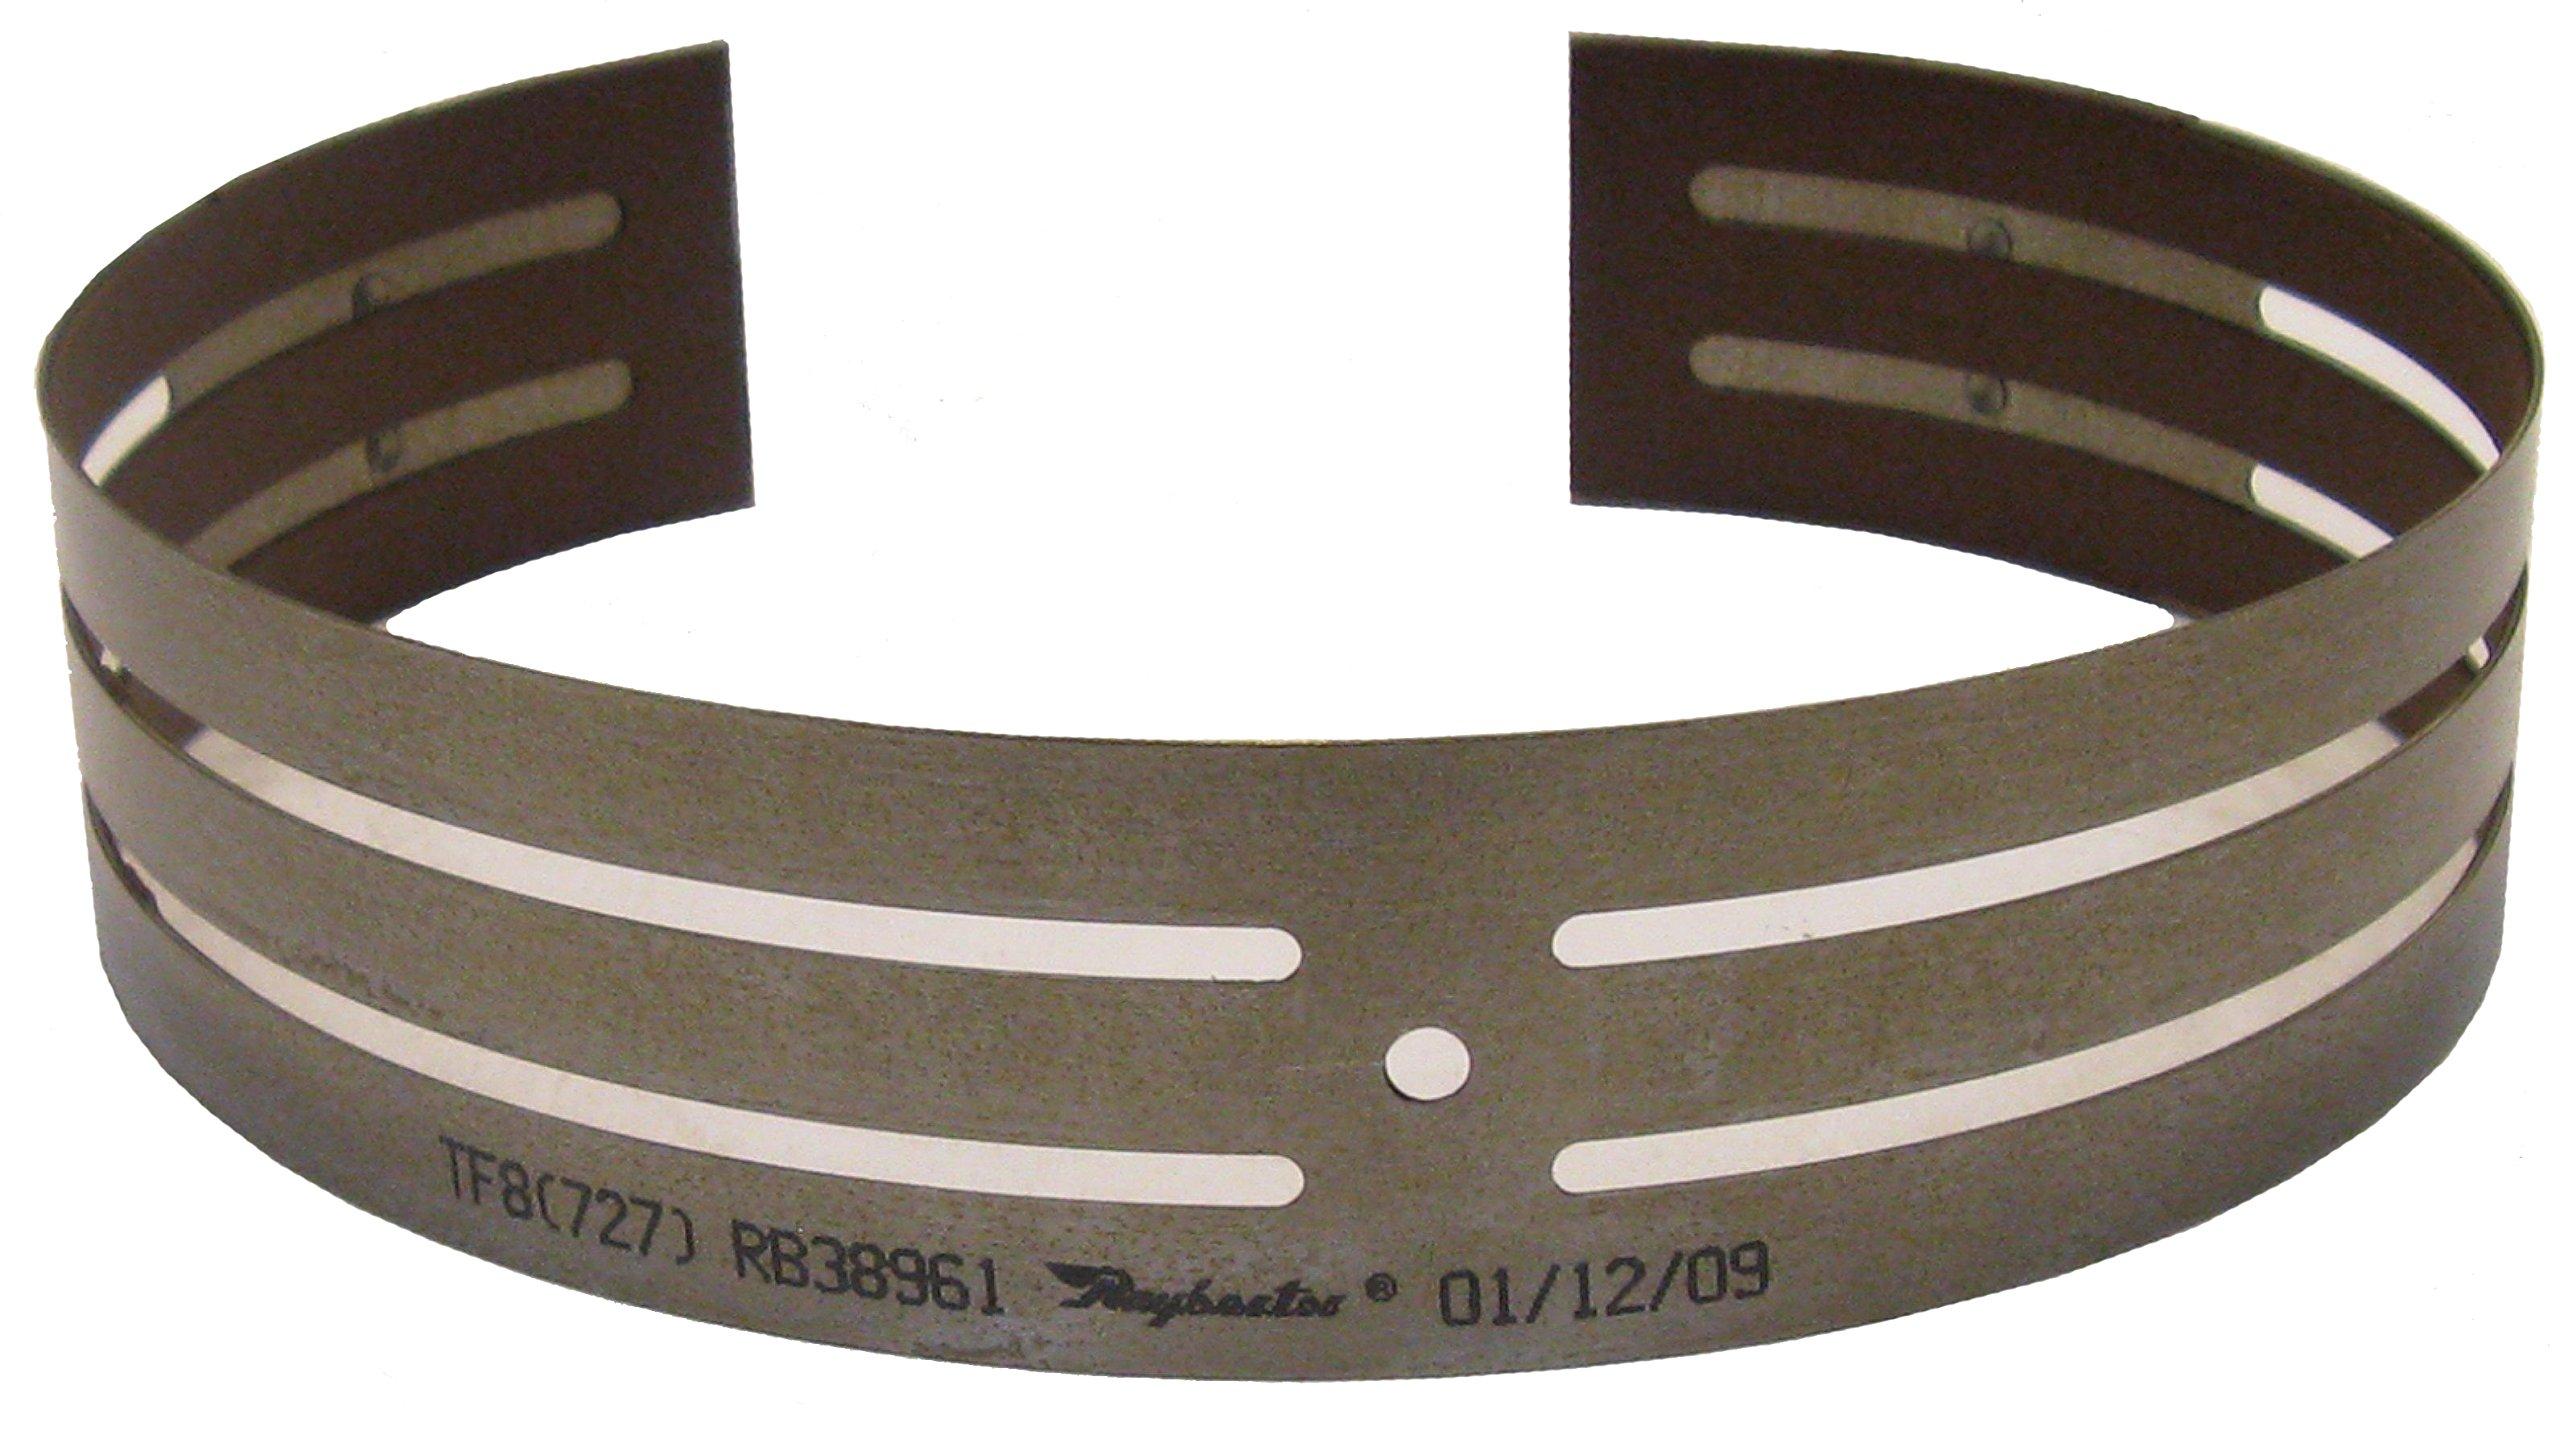 Chrysler P4529017 Intermediate Flex Transmission Kickdown Band (A518/A618 (48RE)/A727:, High Energy, Raybestos)